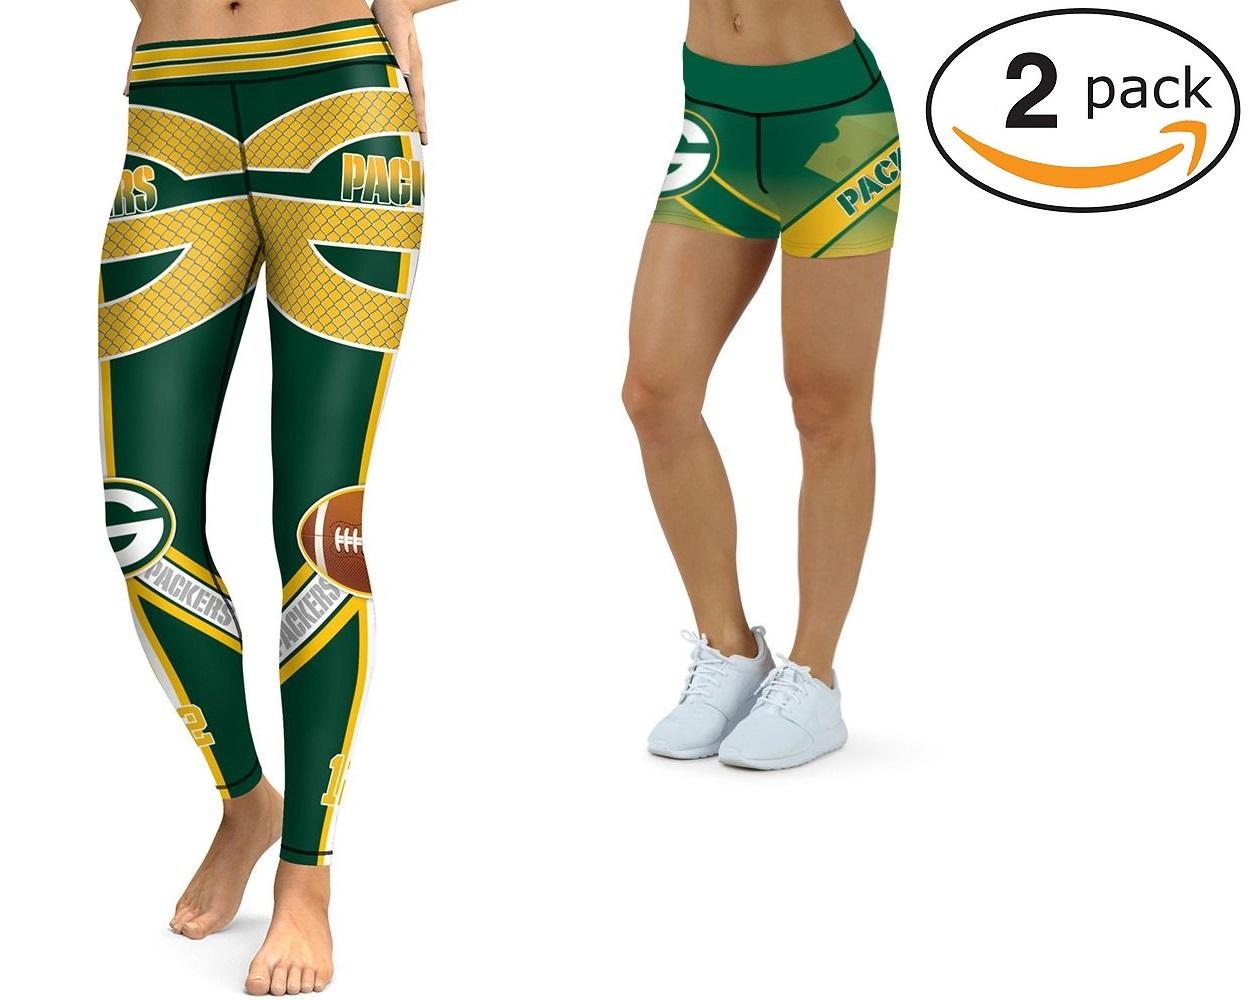 28b3819ebfe4e Green Bay Packers NFL 2018 Two Packs Leggings & Mini Shorts Womens ...